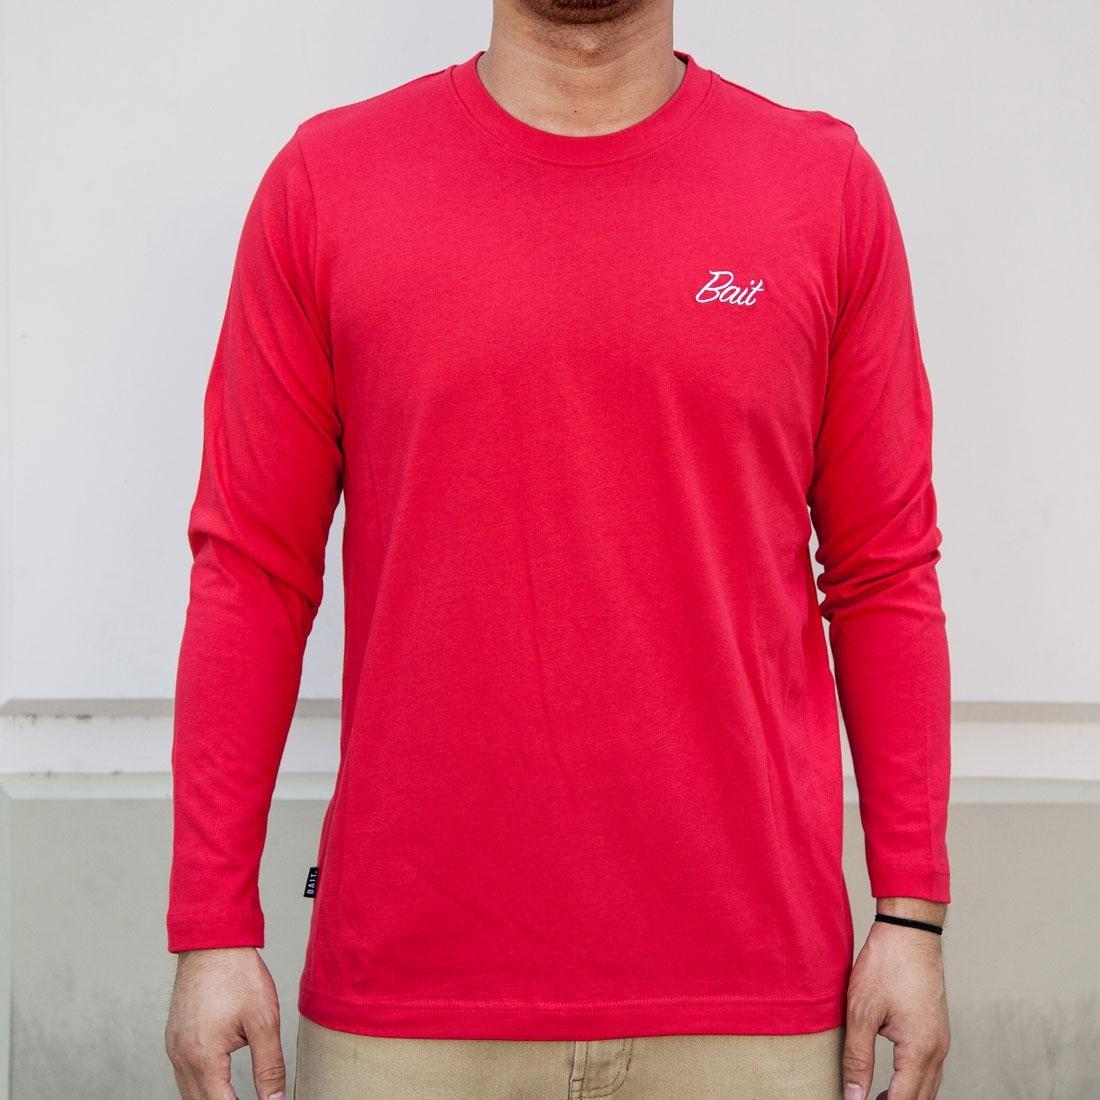 BAIT Men Core Long Sleeve Tee (red)